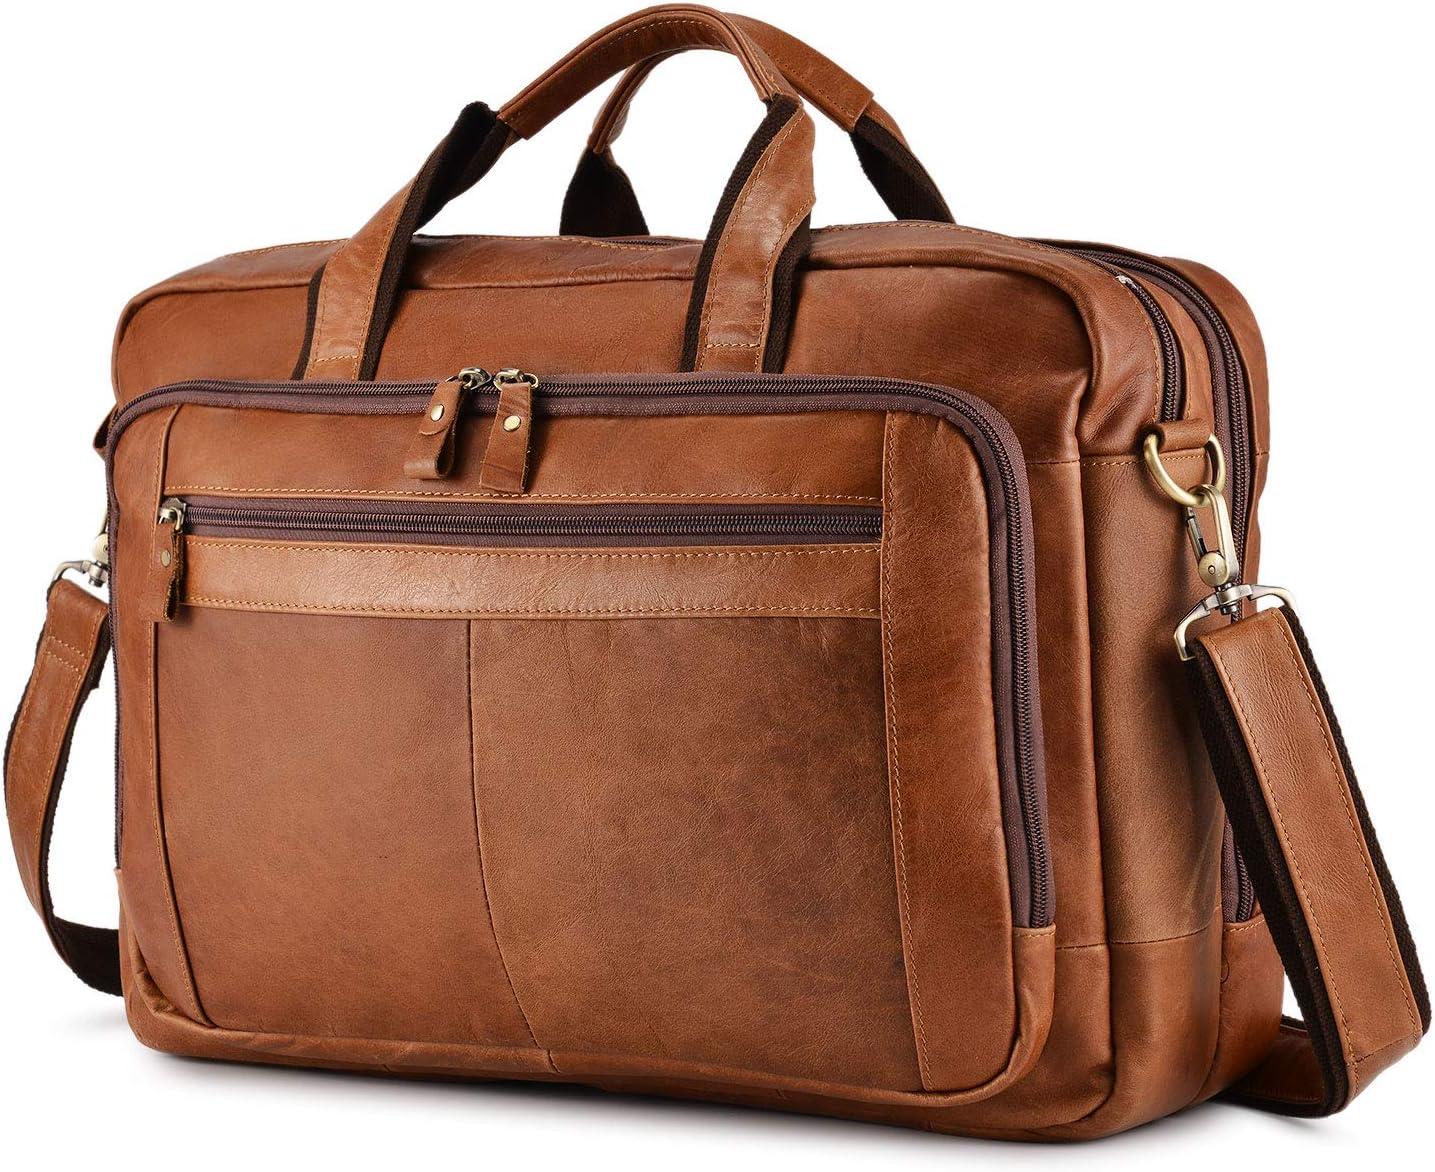 "BAIGIO Men's Leather 17"" Laptop Business Briefcase Shoulder Tote Bag Portfolio Satchel Lawyers Briefcases for Men (Tan-2)"